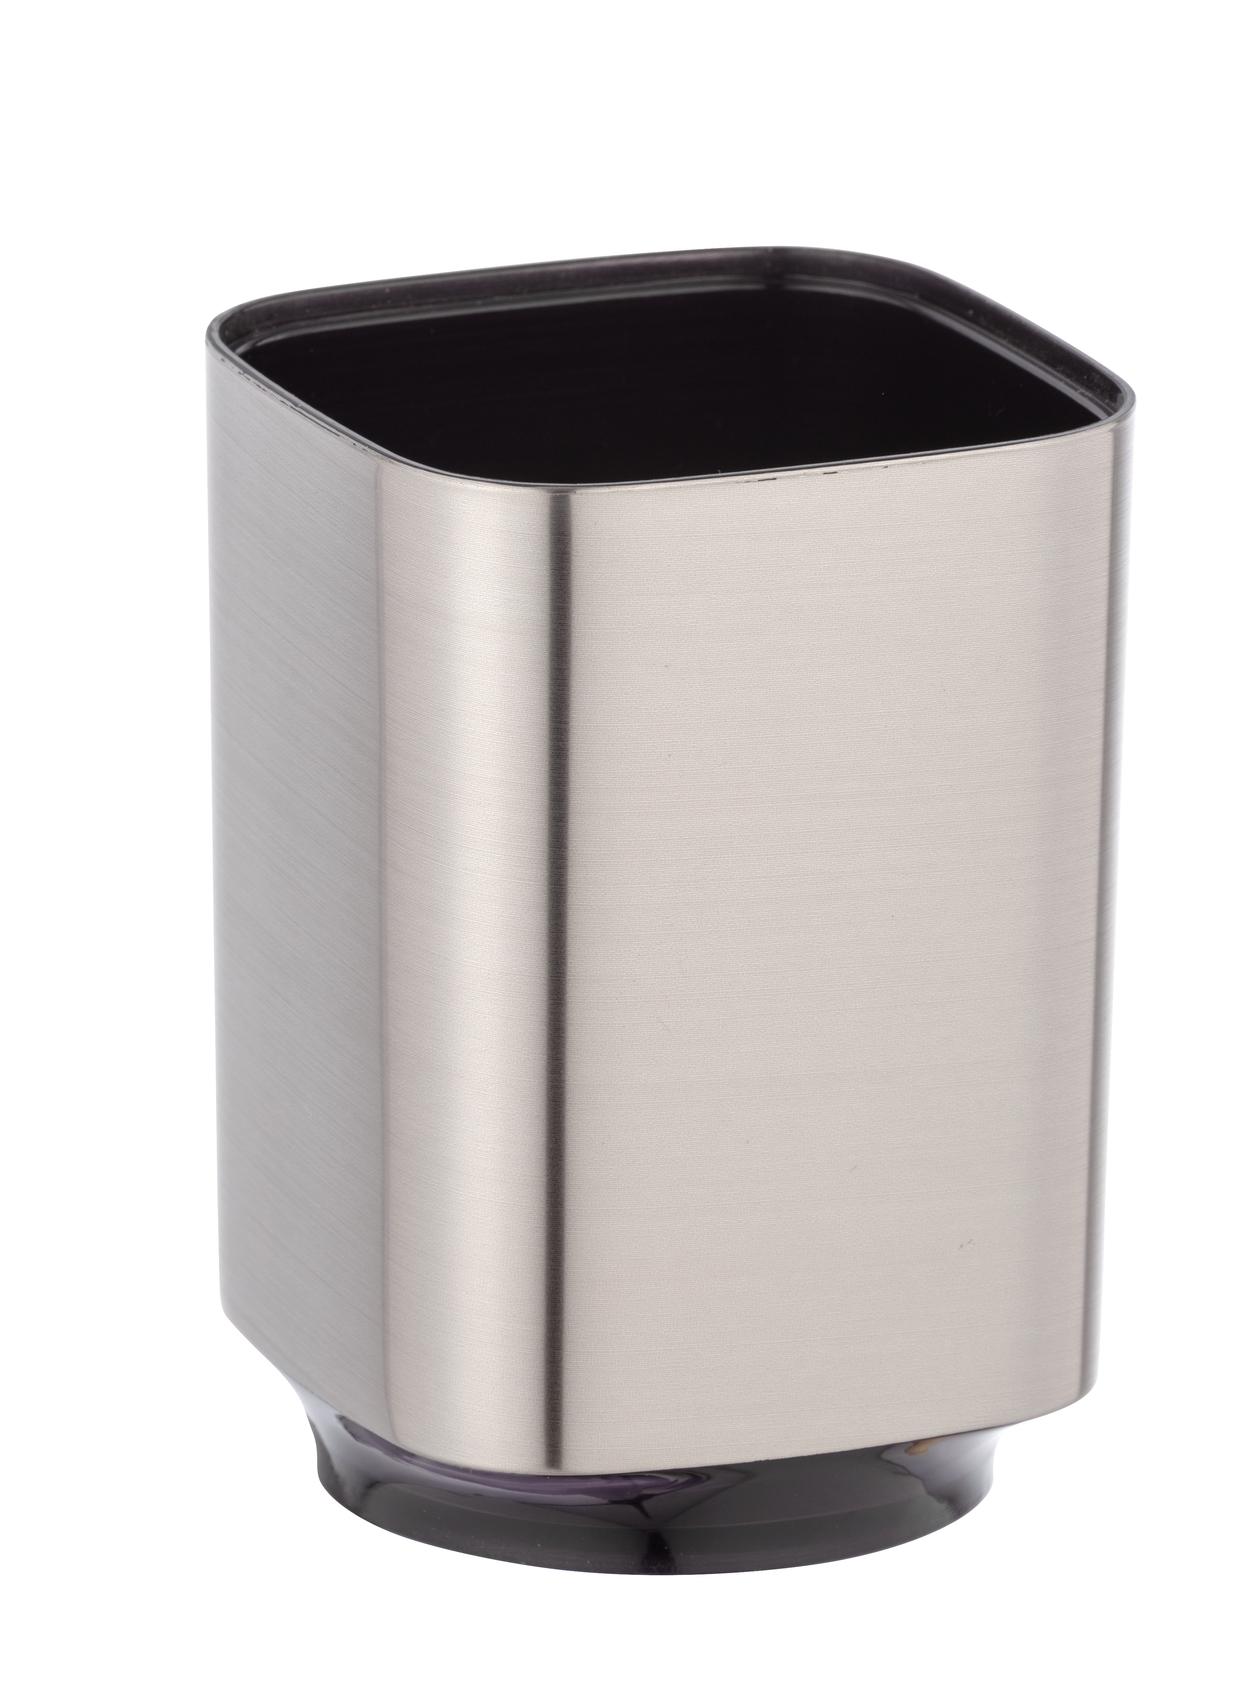 Pahar din plastic pentru periuta de dinti, Auron Crom, L7xl7xH10 cm imagine